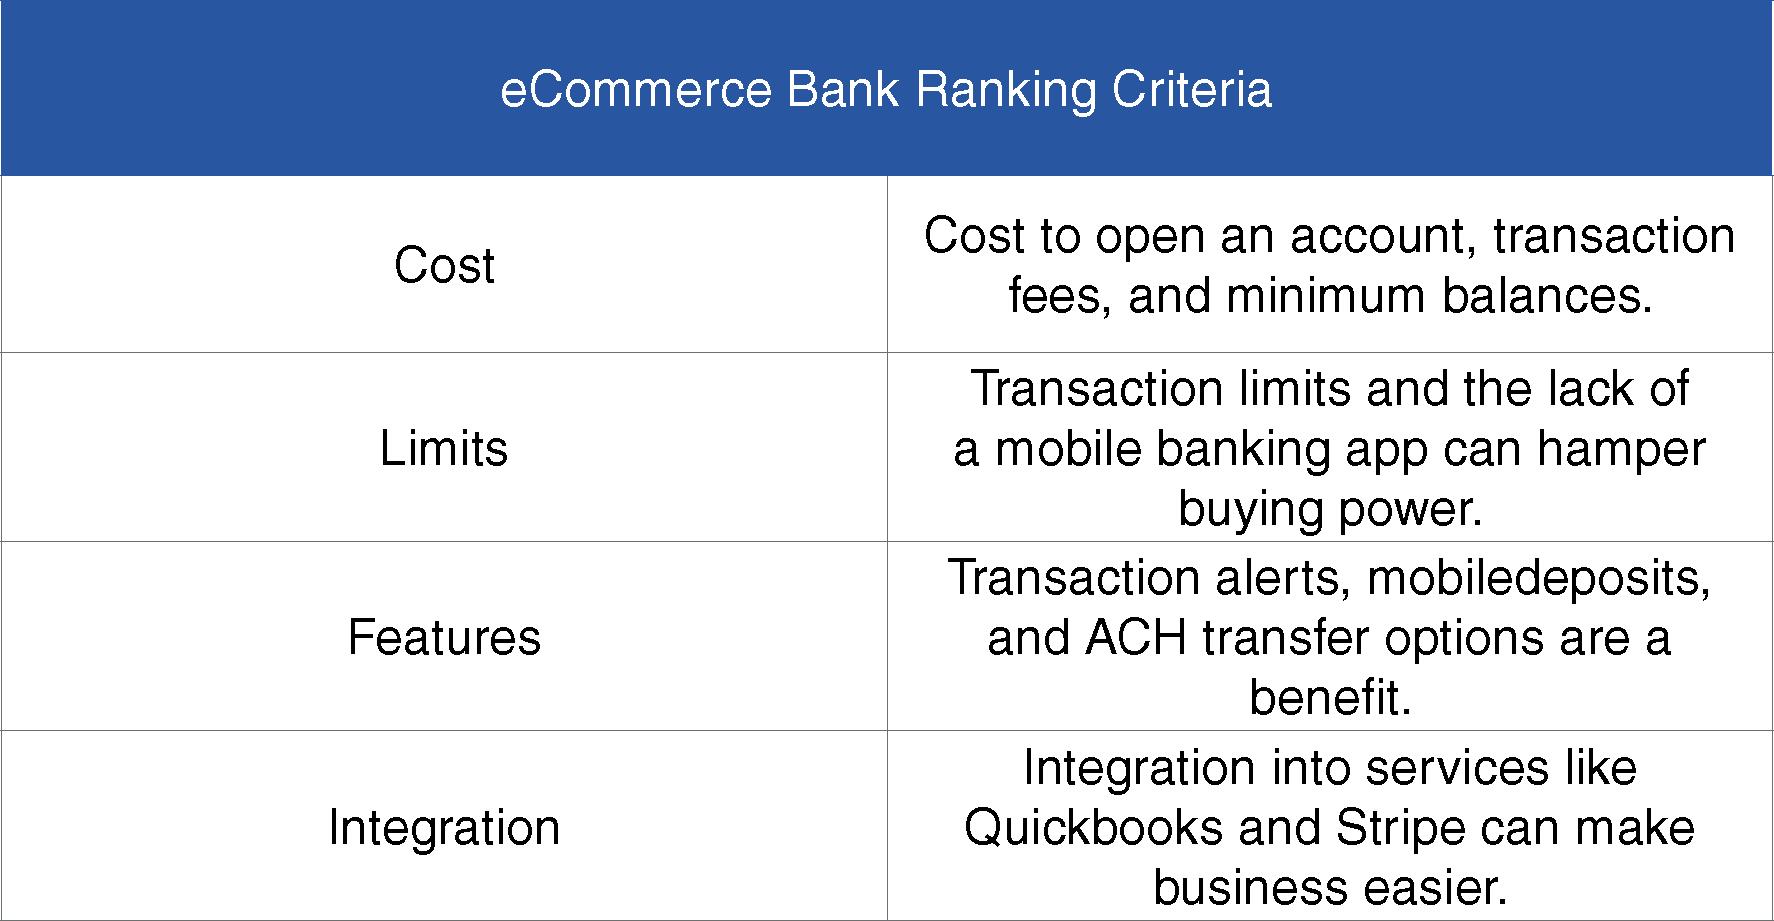 eCommerce Bank Ranking Criteria